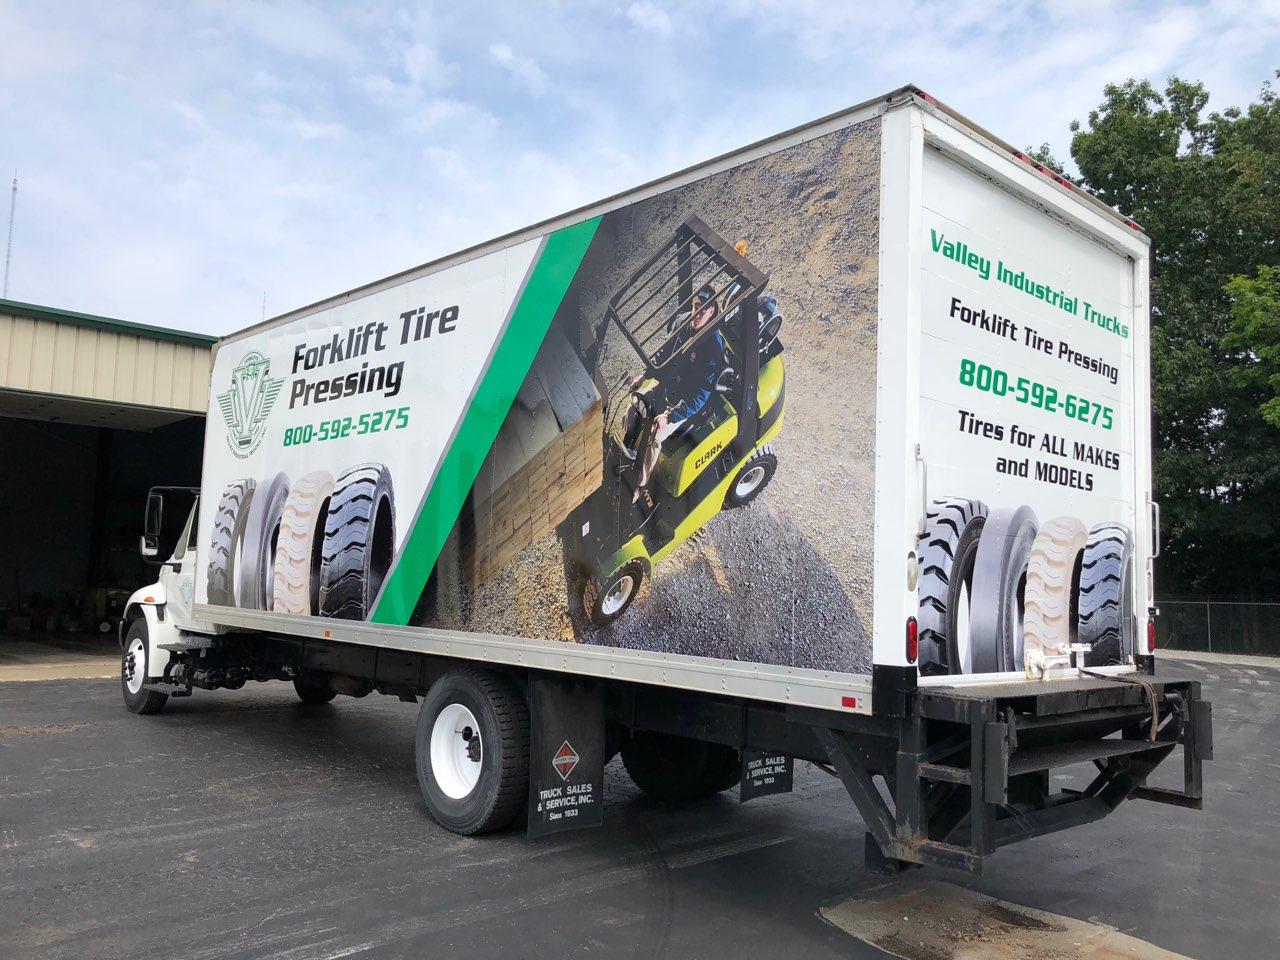 Forklift Mobile Tire Press